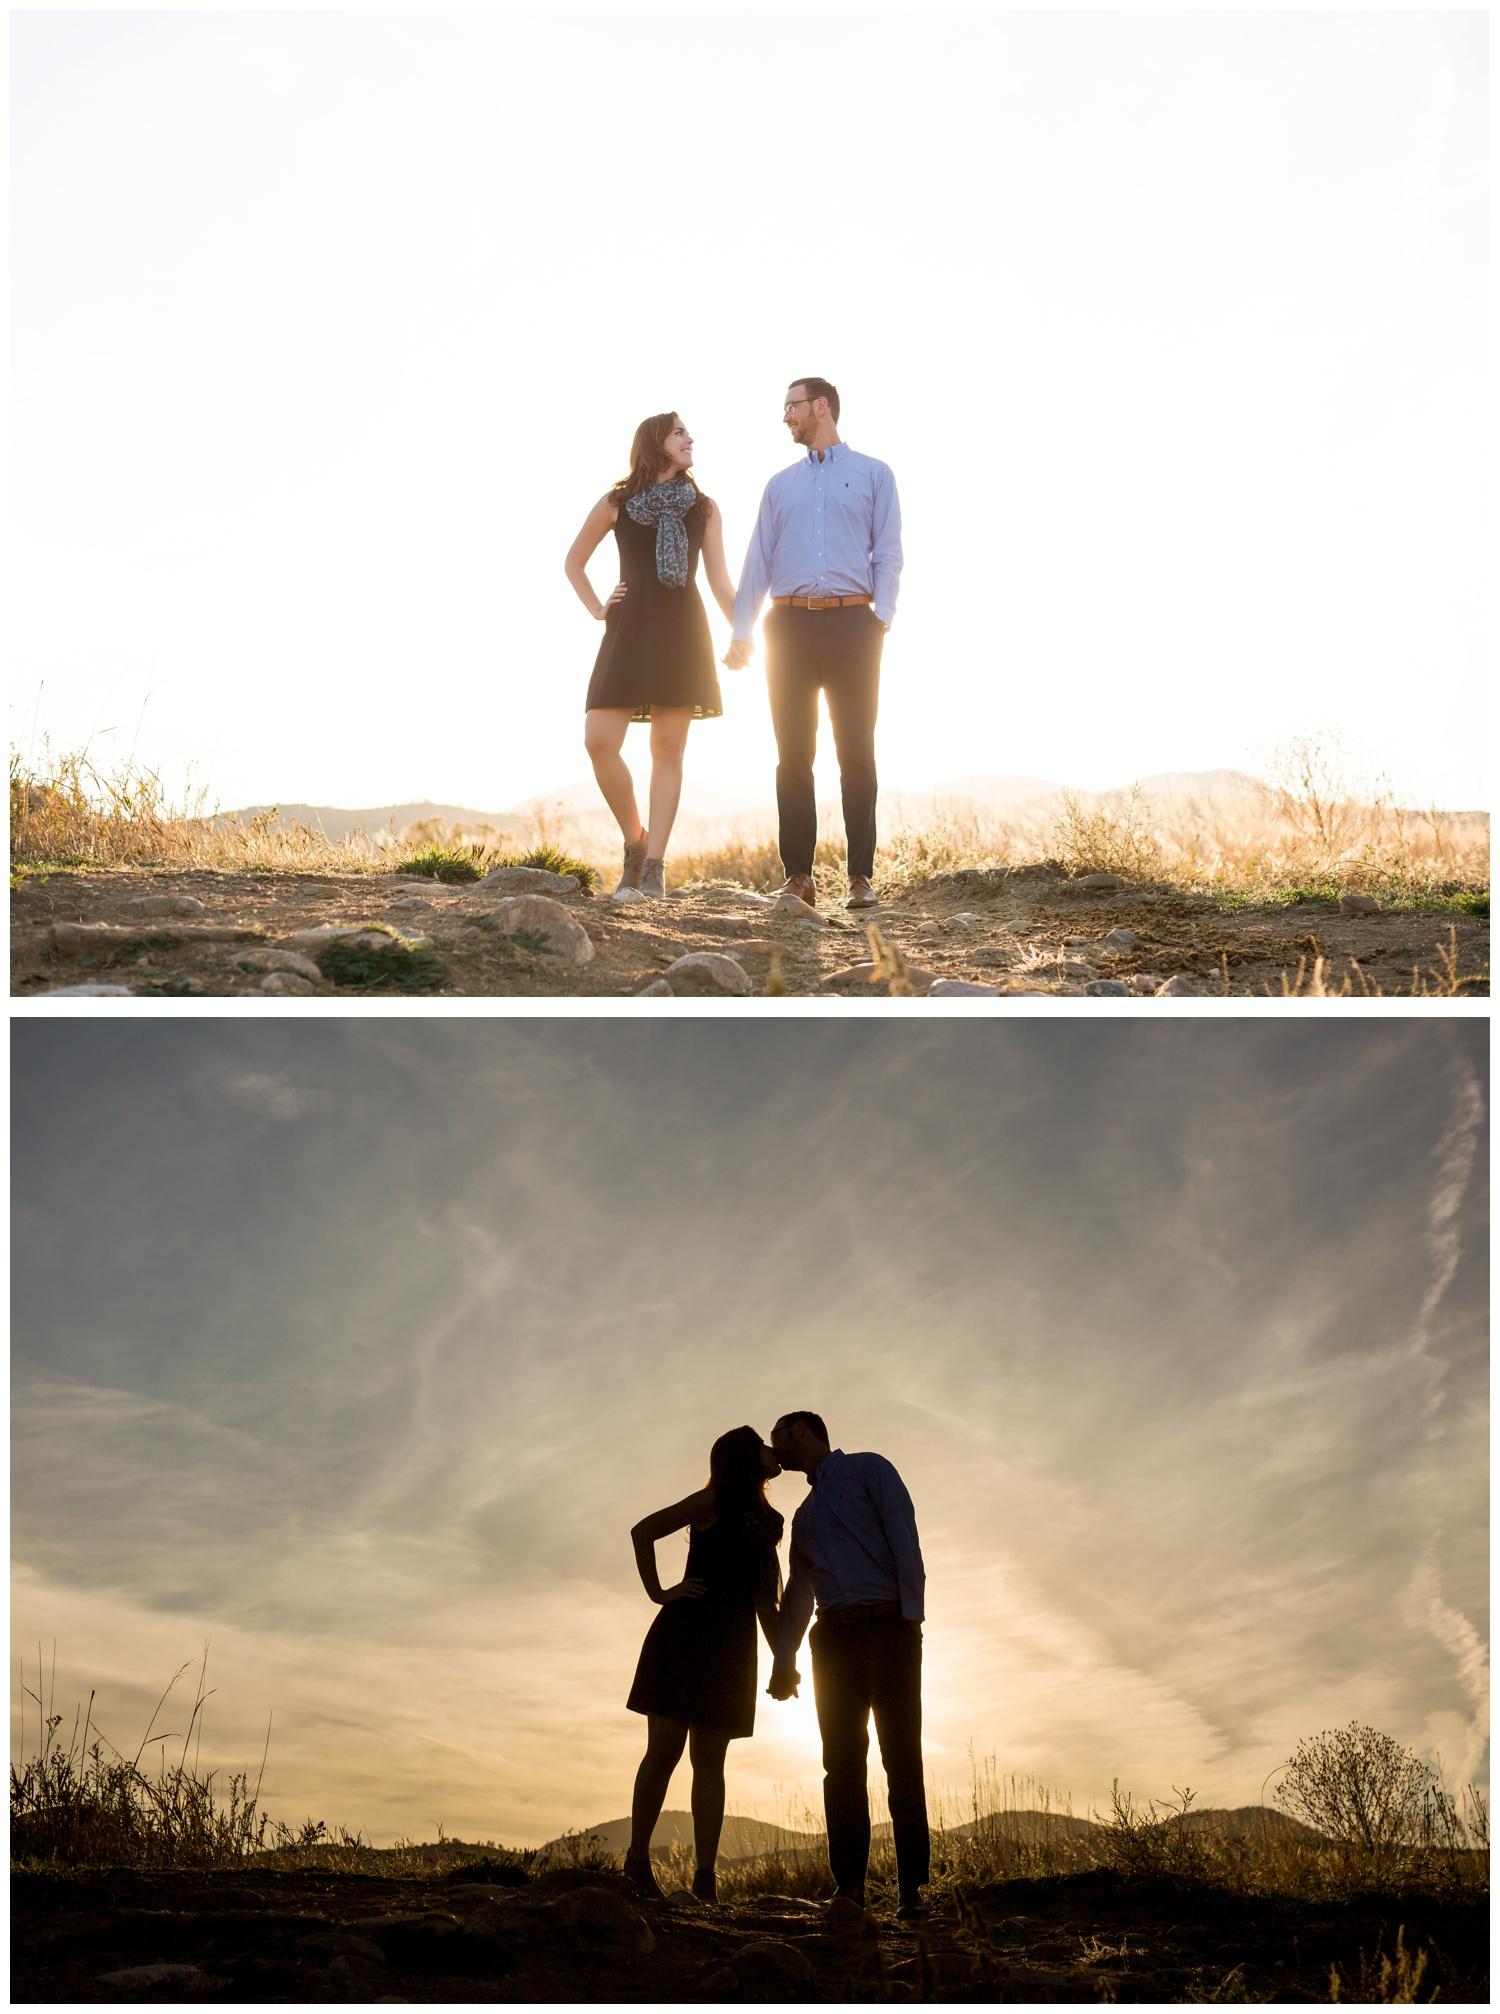 denver engagement photography07.jpg